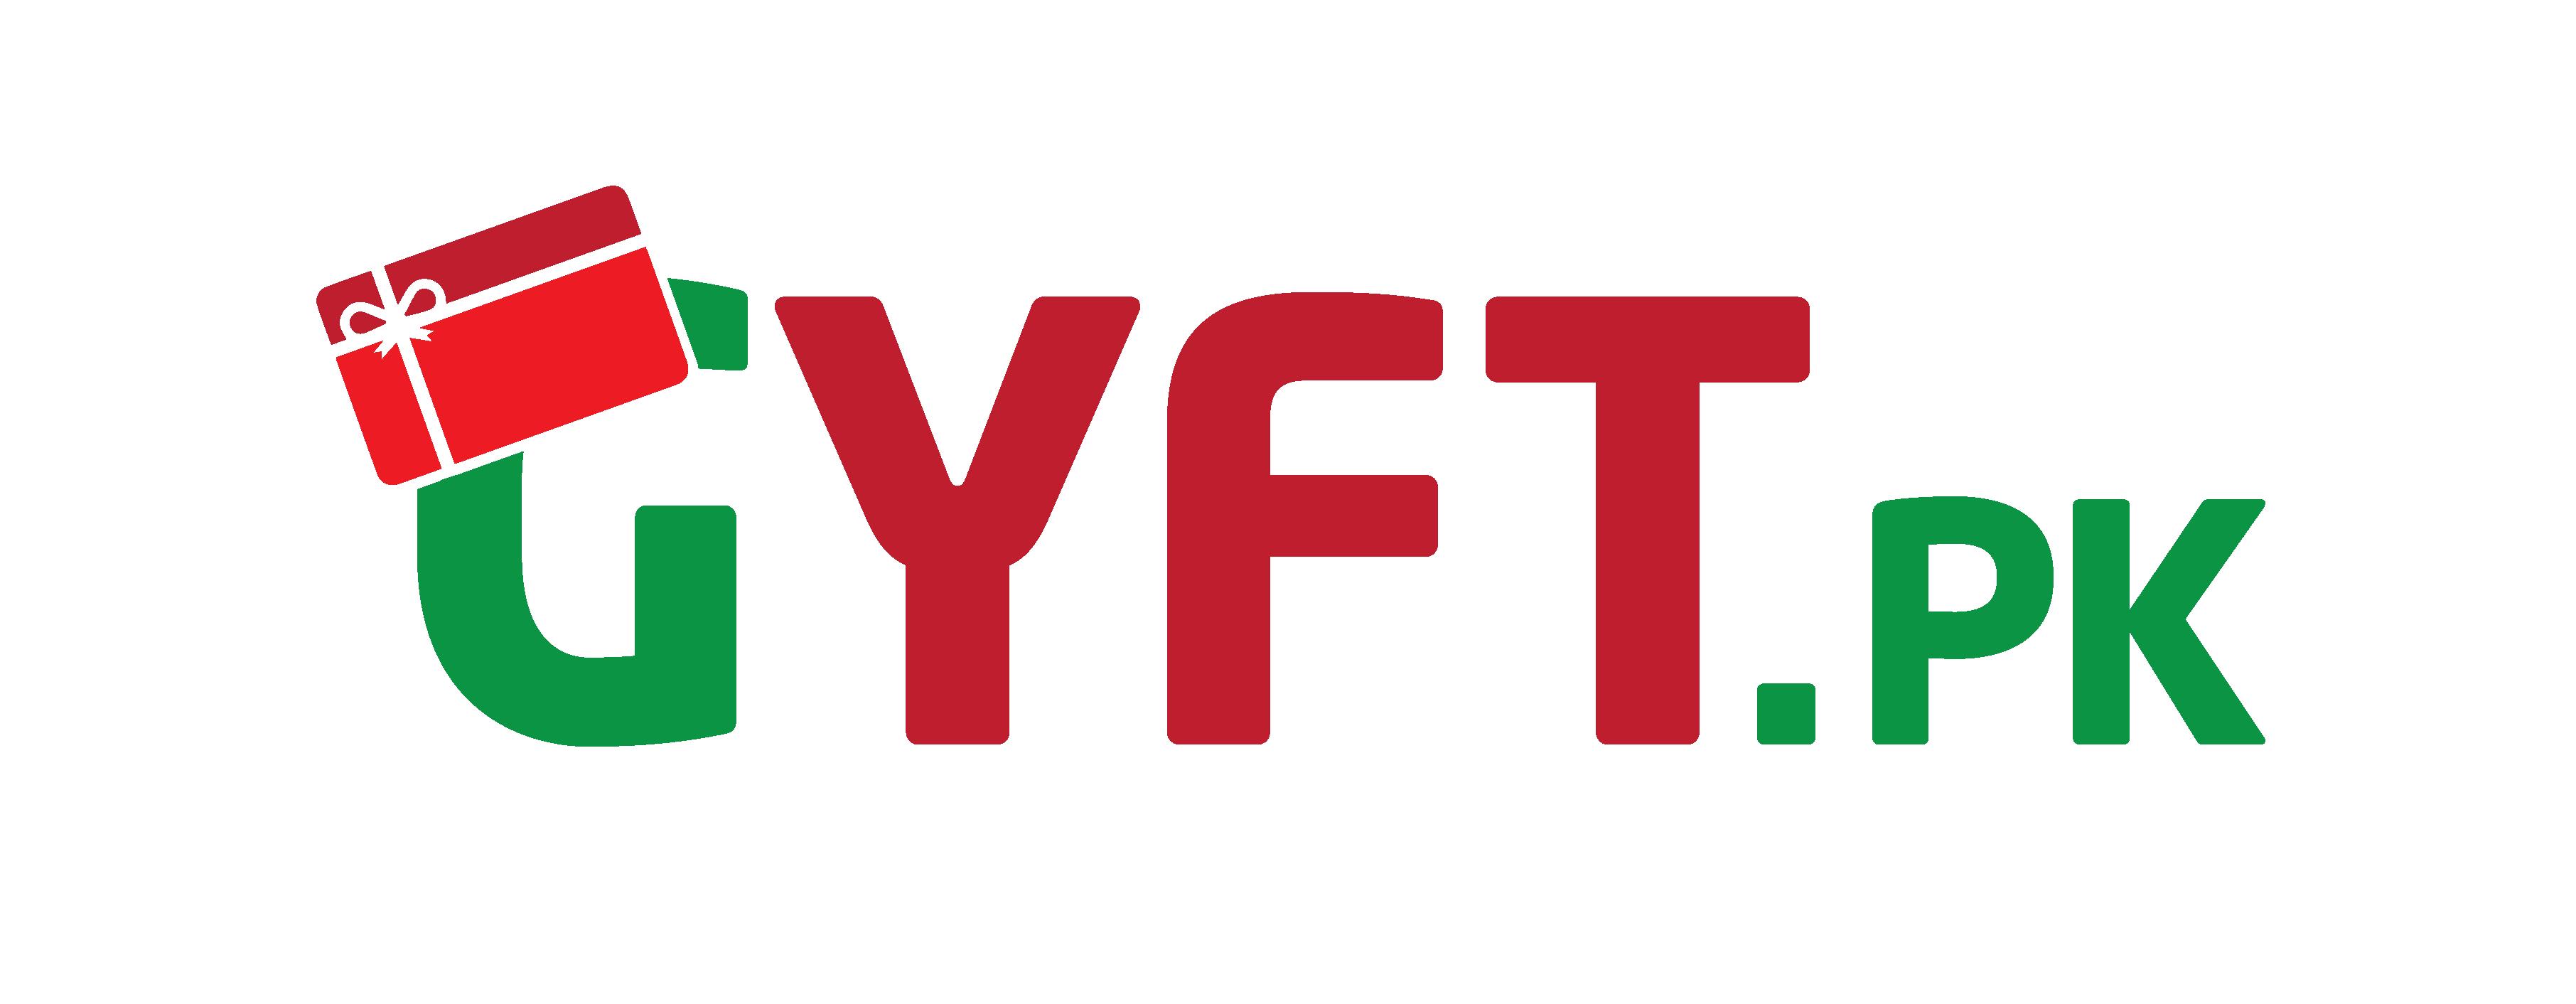 Gyft.pk